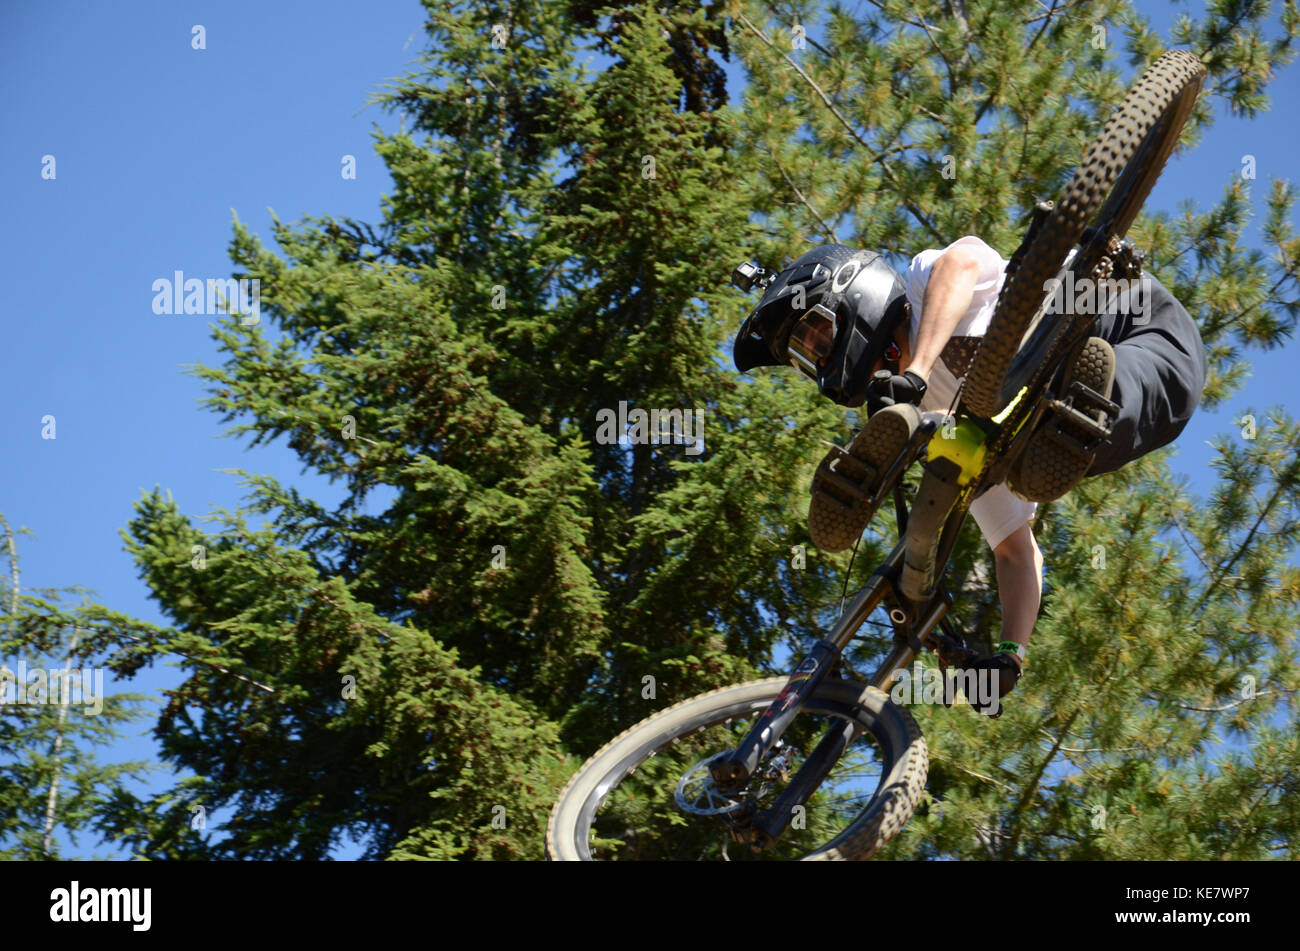 Whip Off World Championships - Crankworx Whistler 2017 - Stock Image